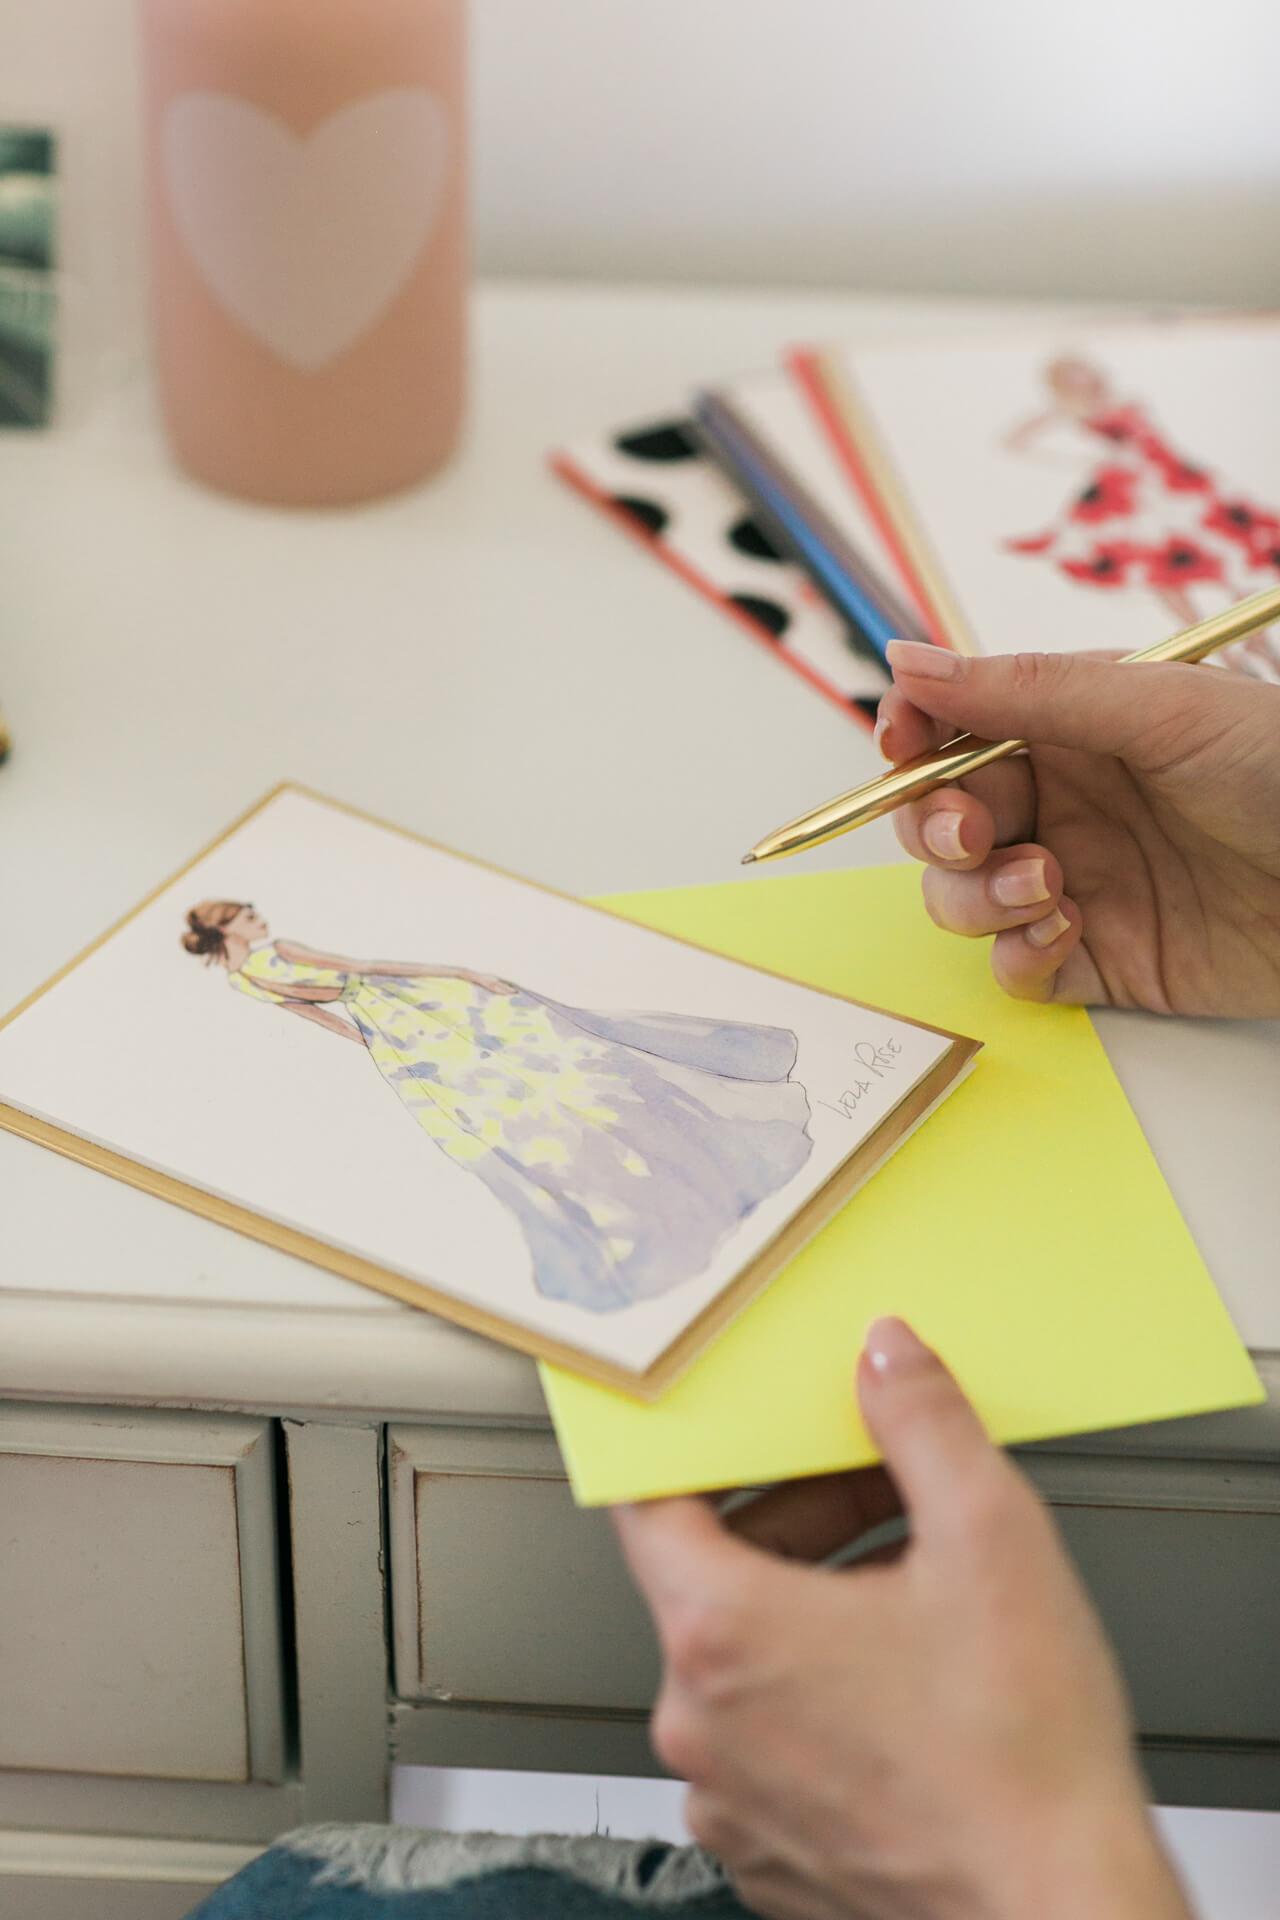 feminine card collaboration between lela rose and papyrus